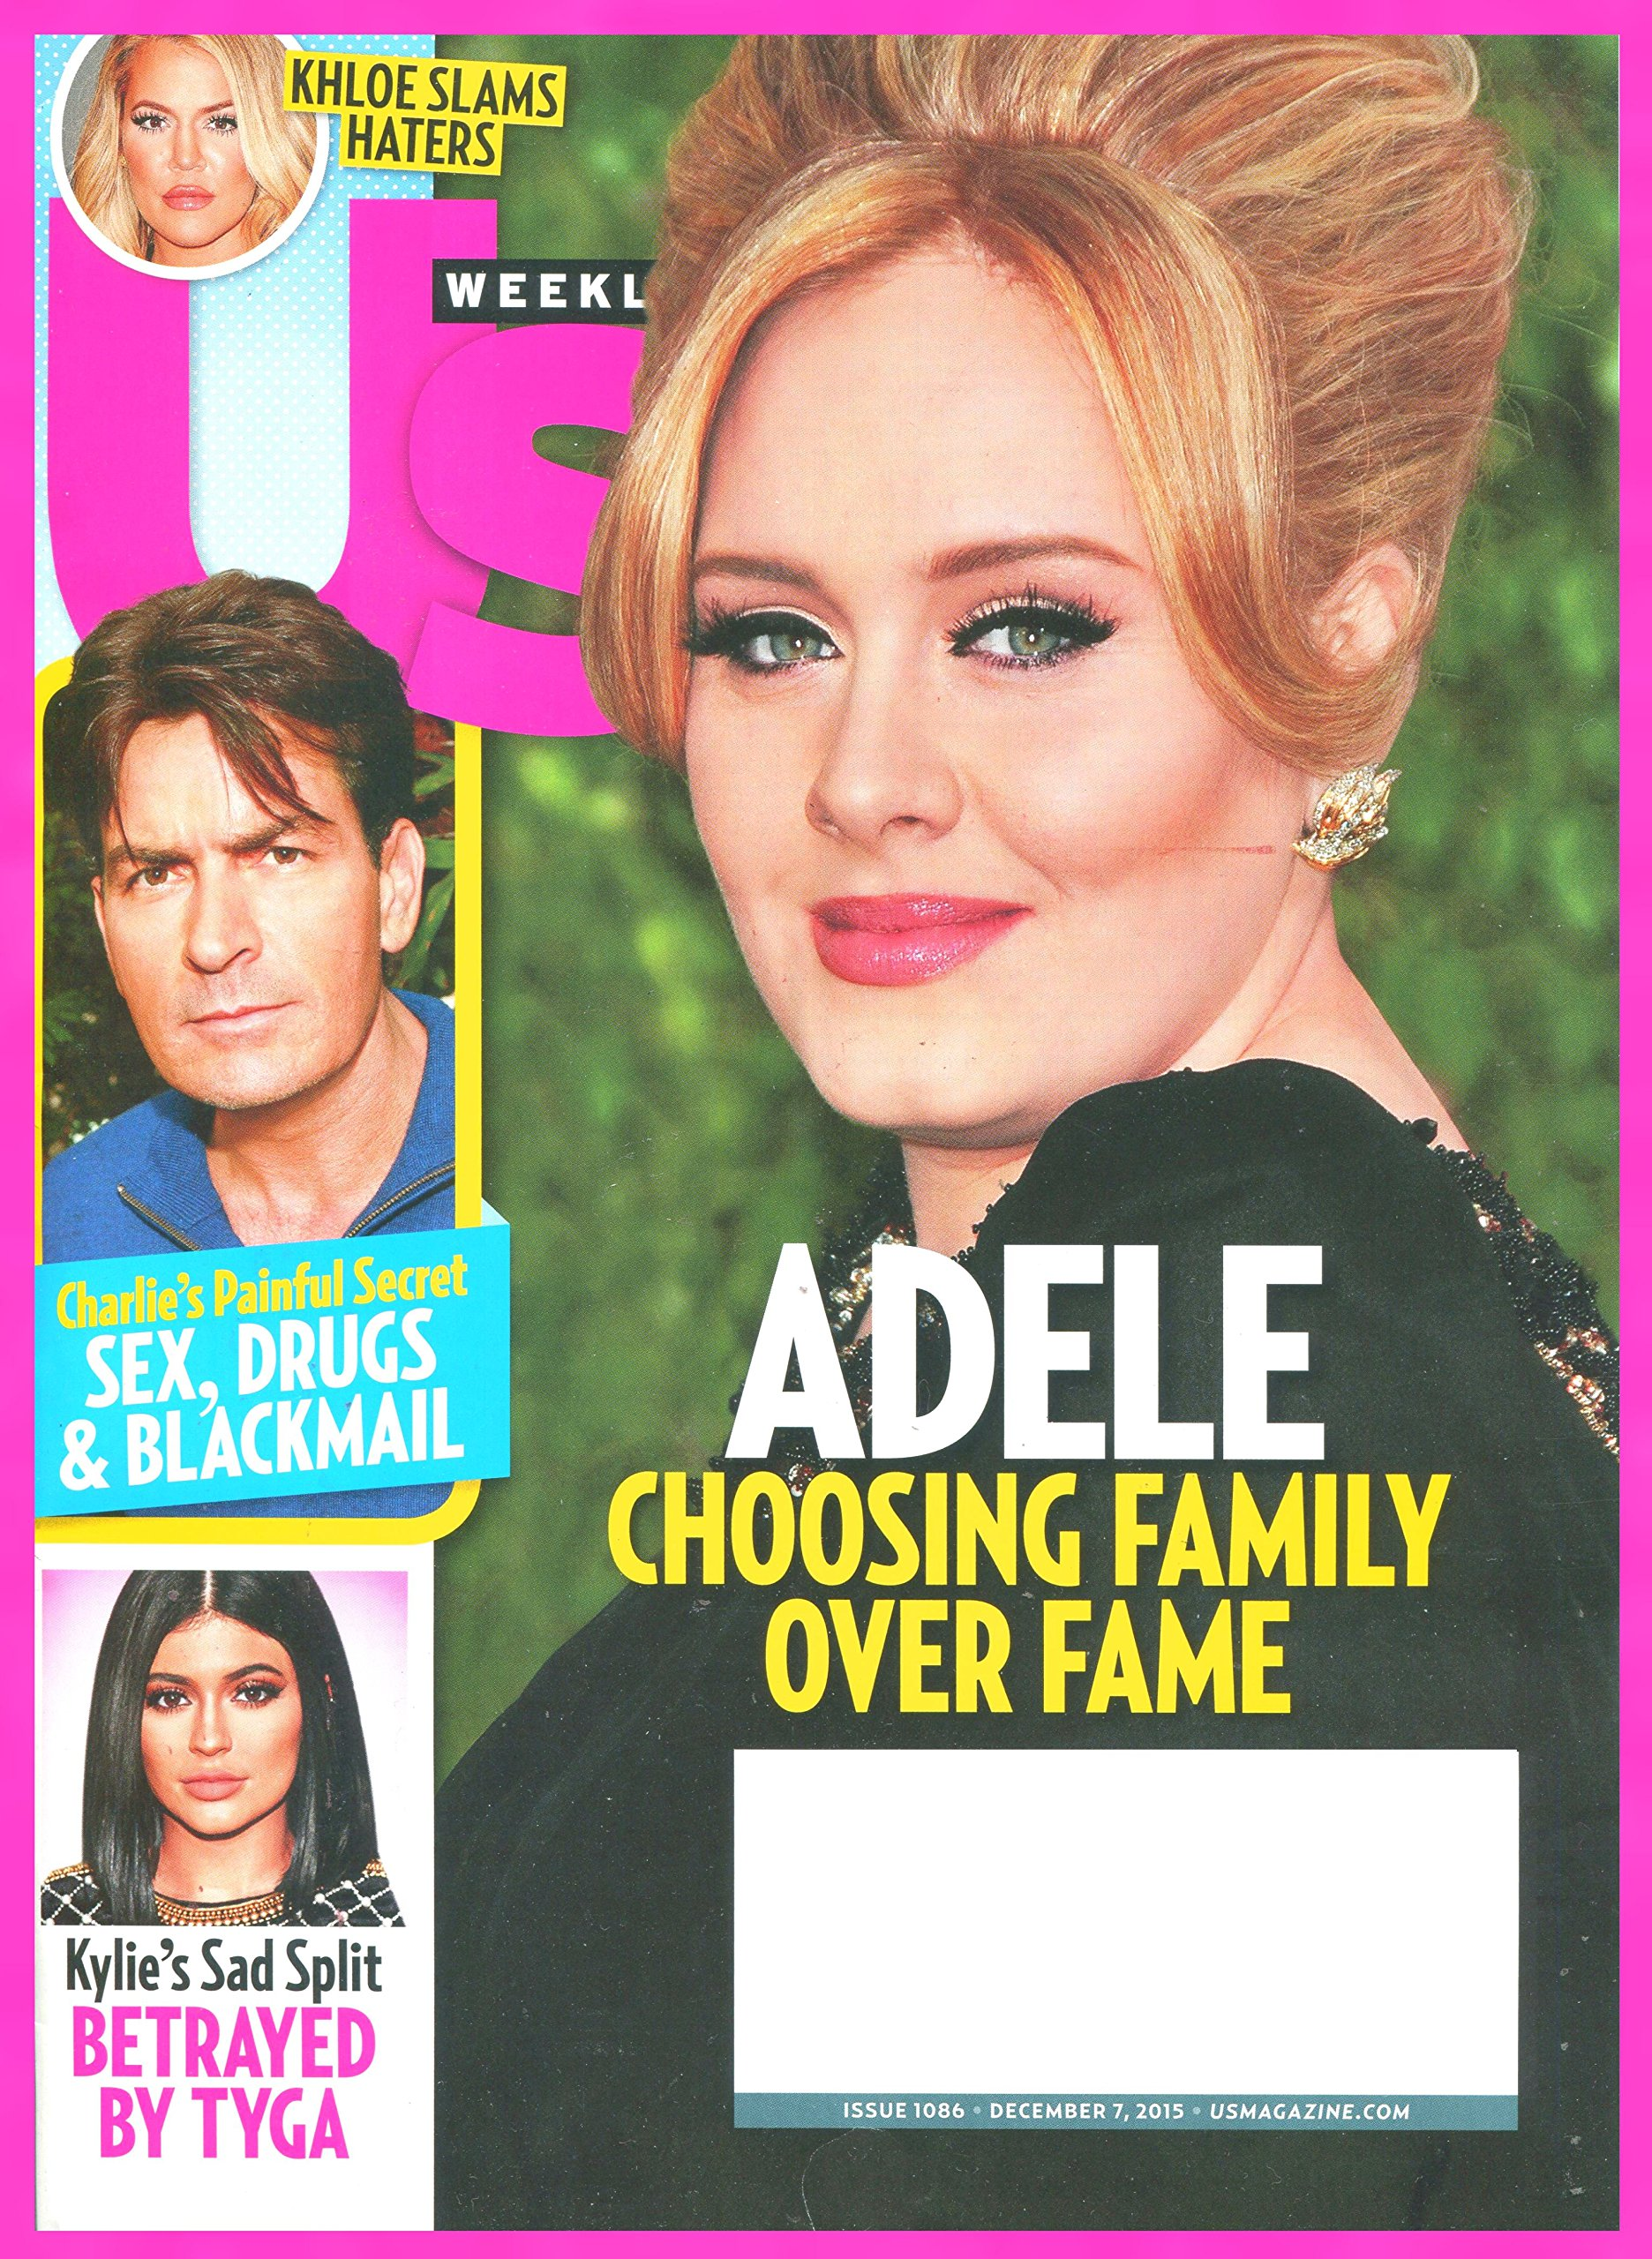 Us WEEKLY Magazine December 7, 2015 - ADELE Cover Charlie Sheen, Kloe, Kylie PDF